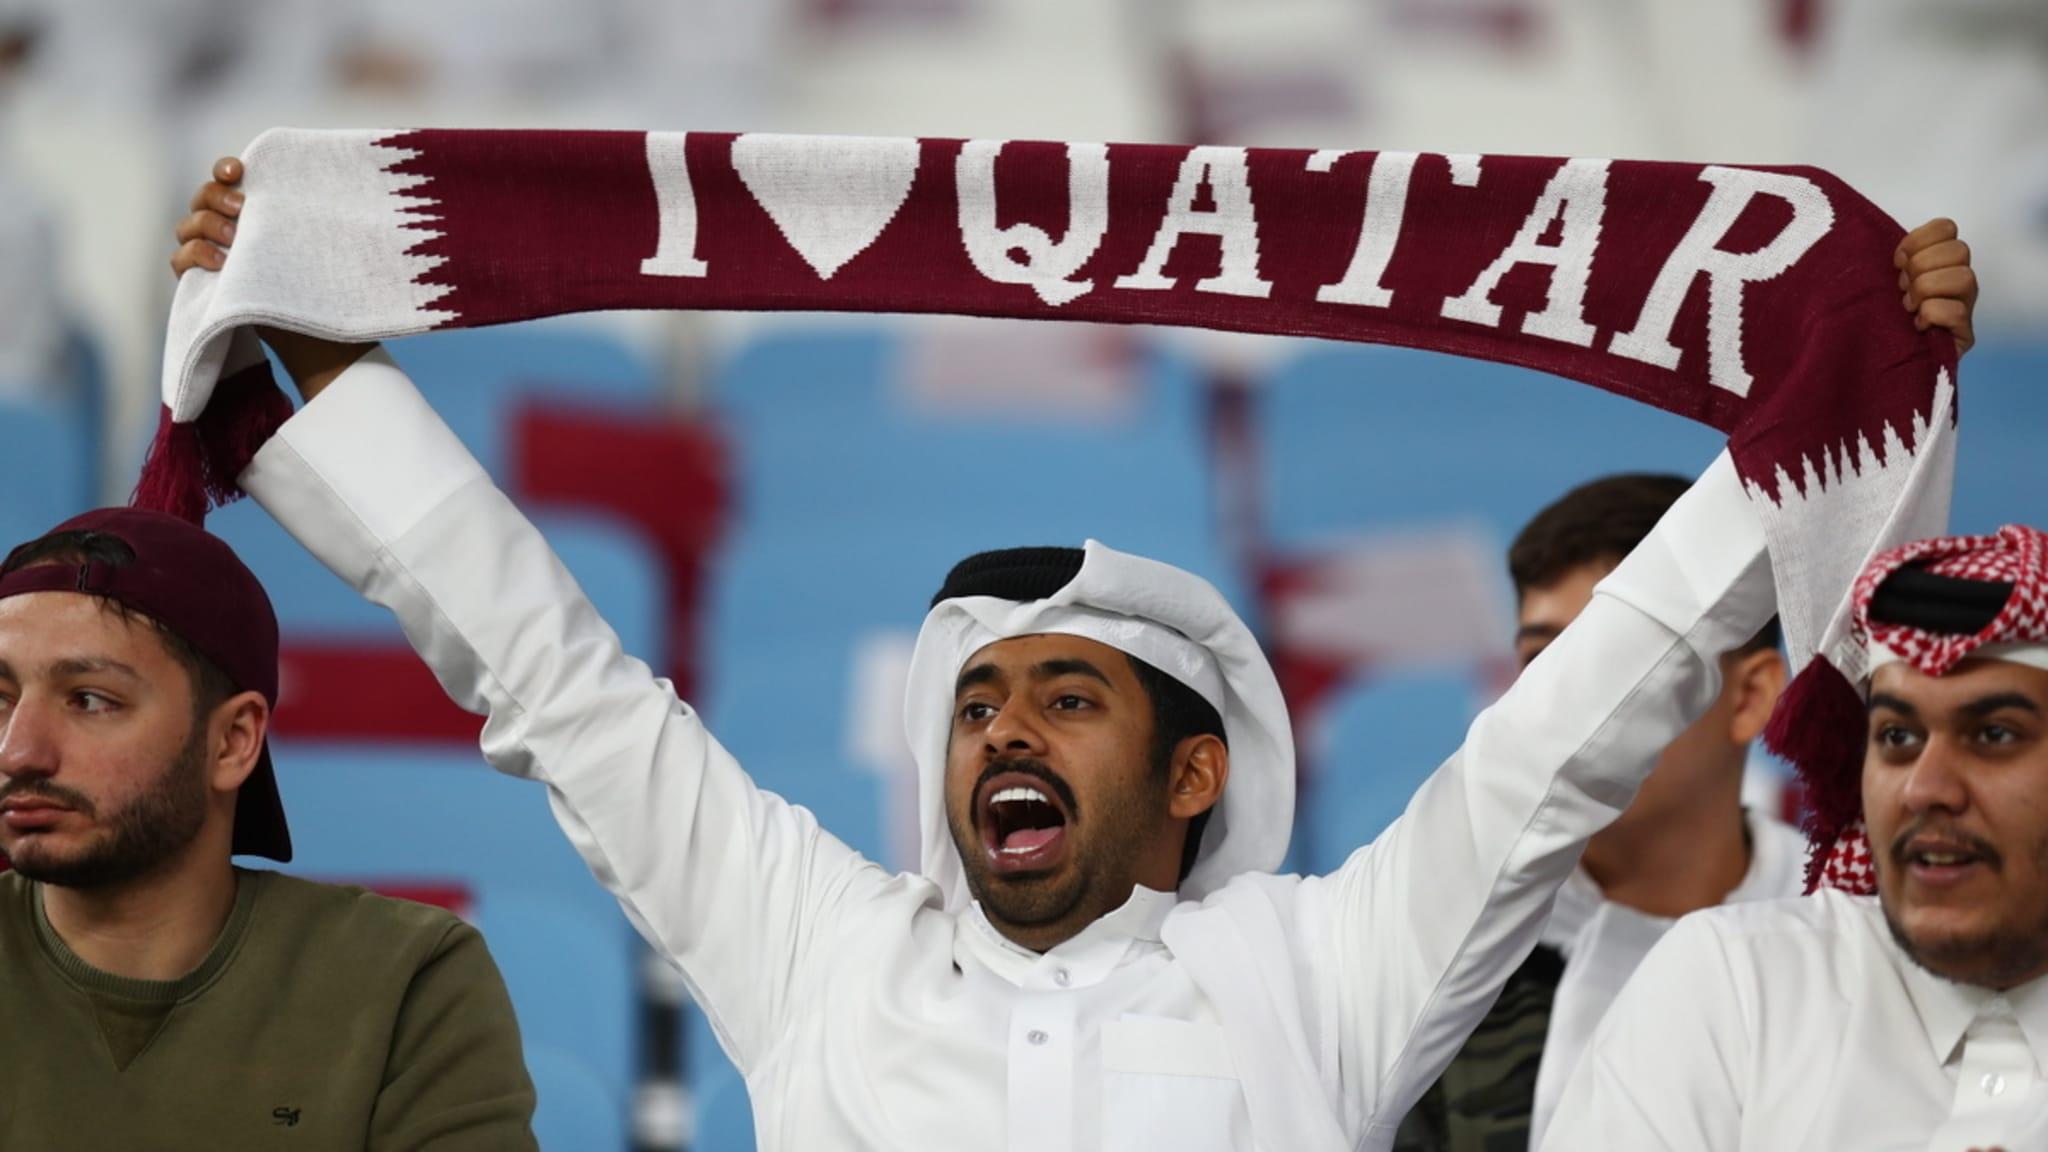 A Qatar supporter